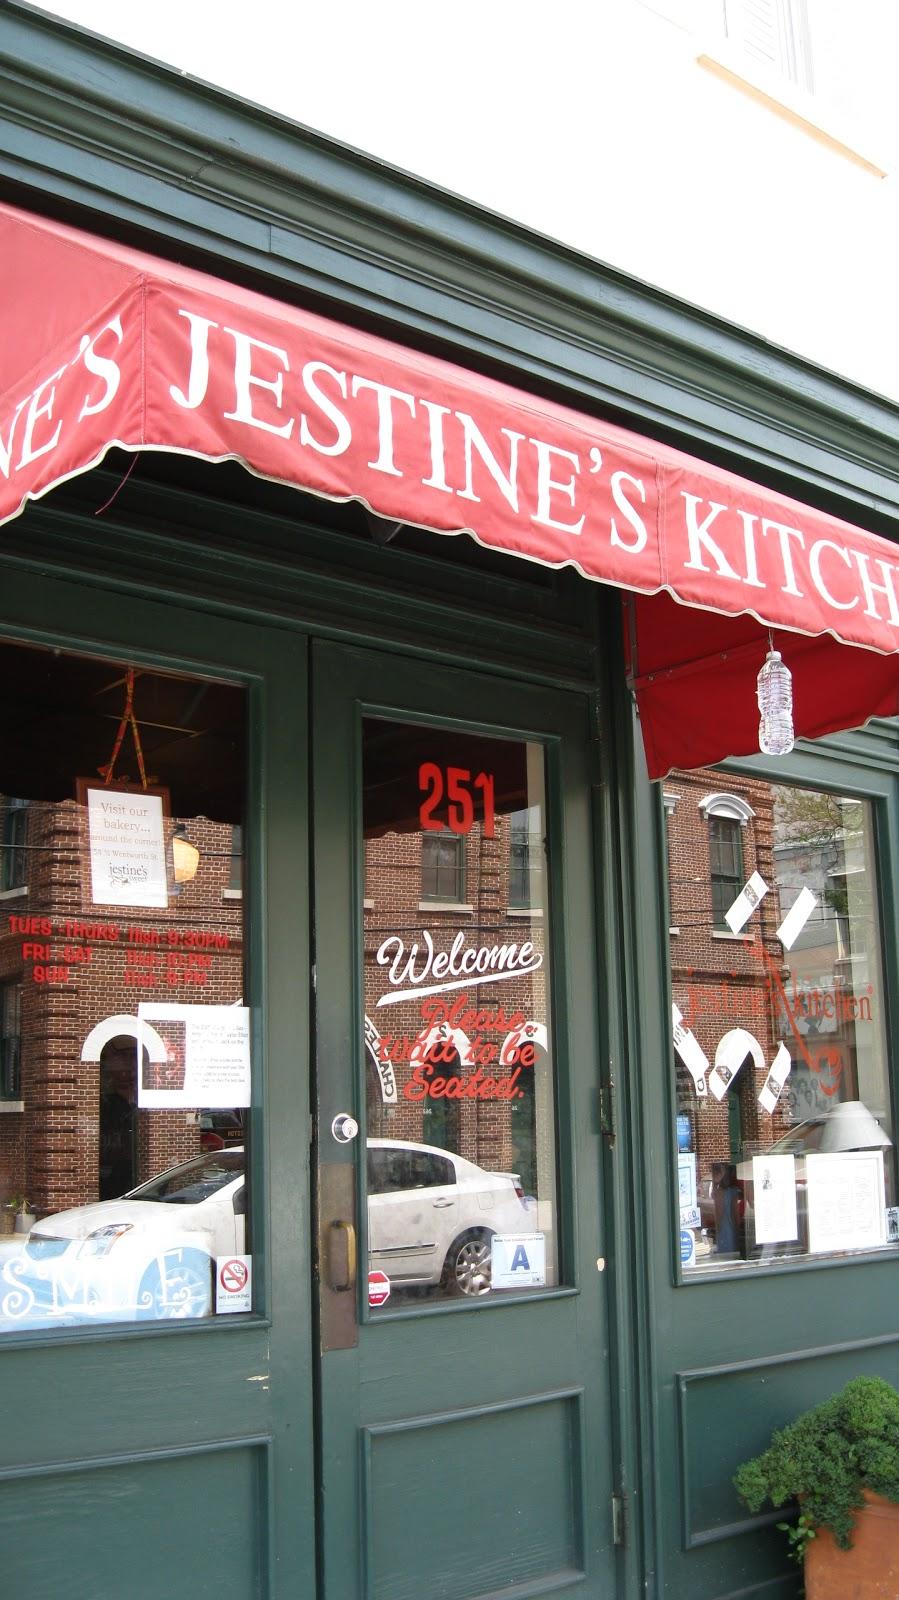 19+ Beautifully Jestine's Kitchen Charleston That Will Impress Your Friends